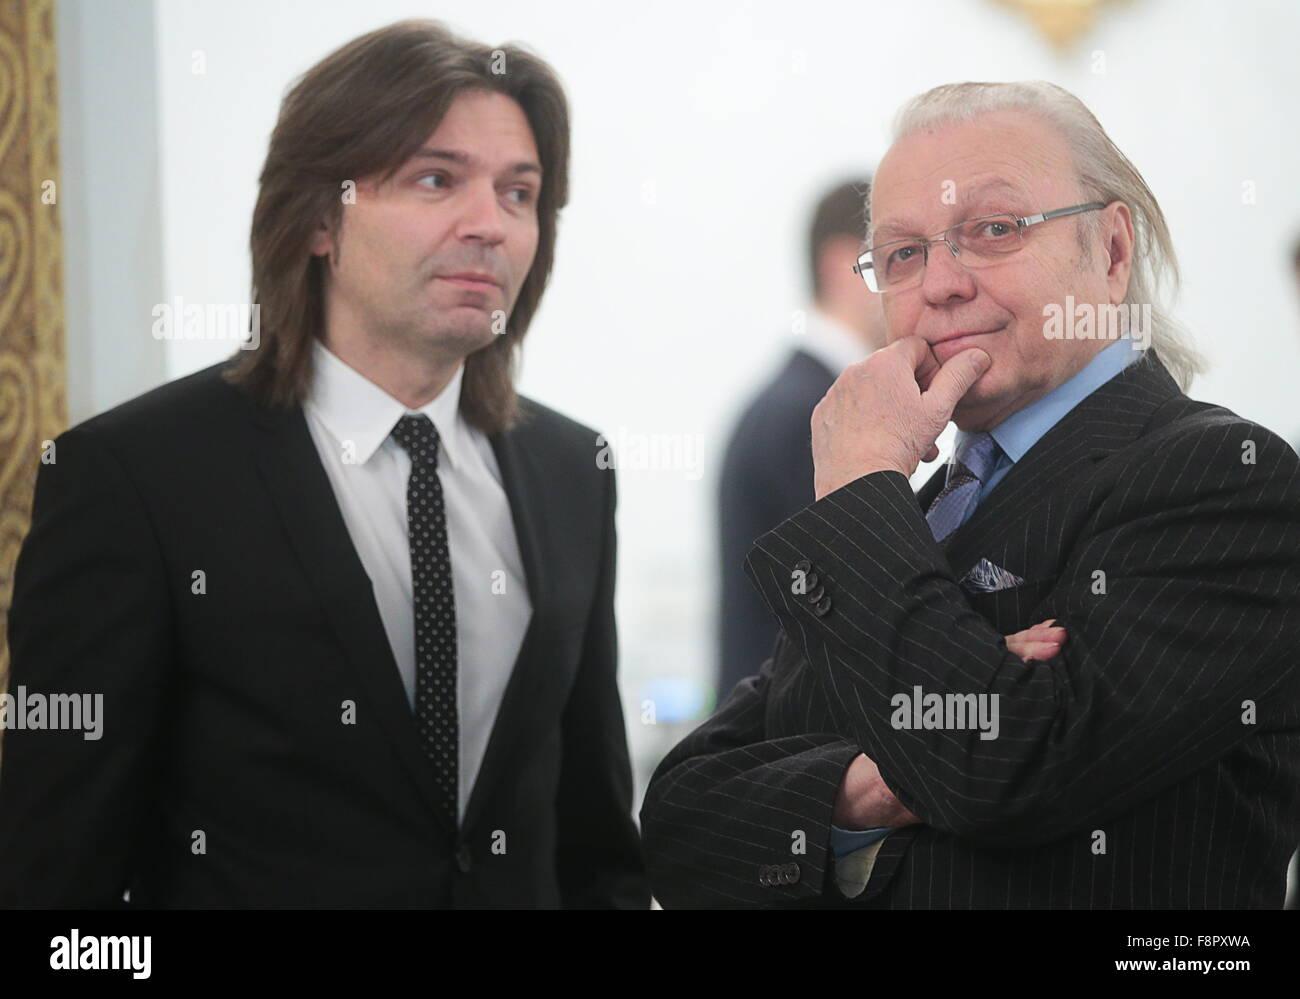 Malikov wants to raise his son a real man 21.02.2018 91